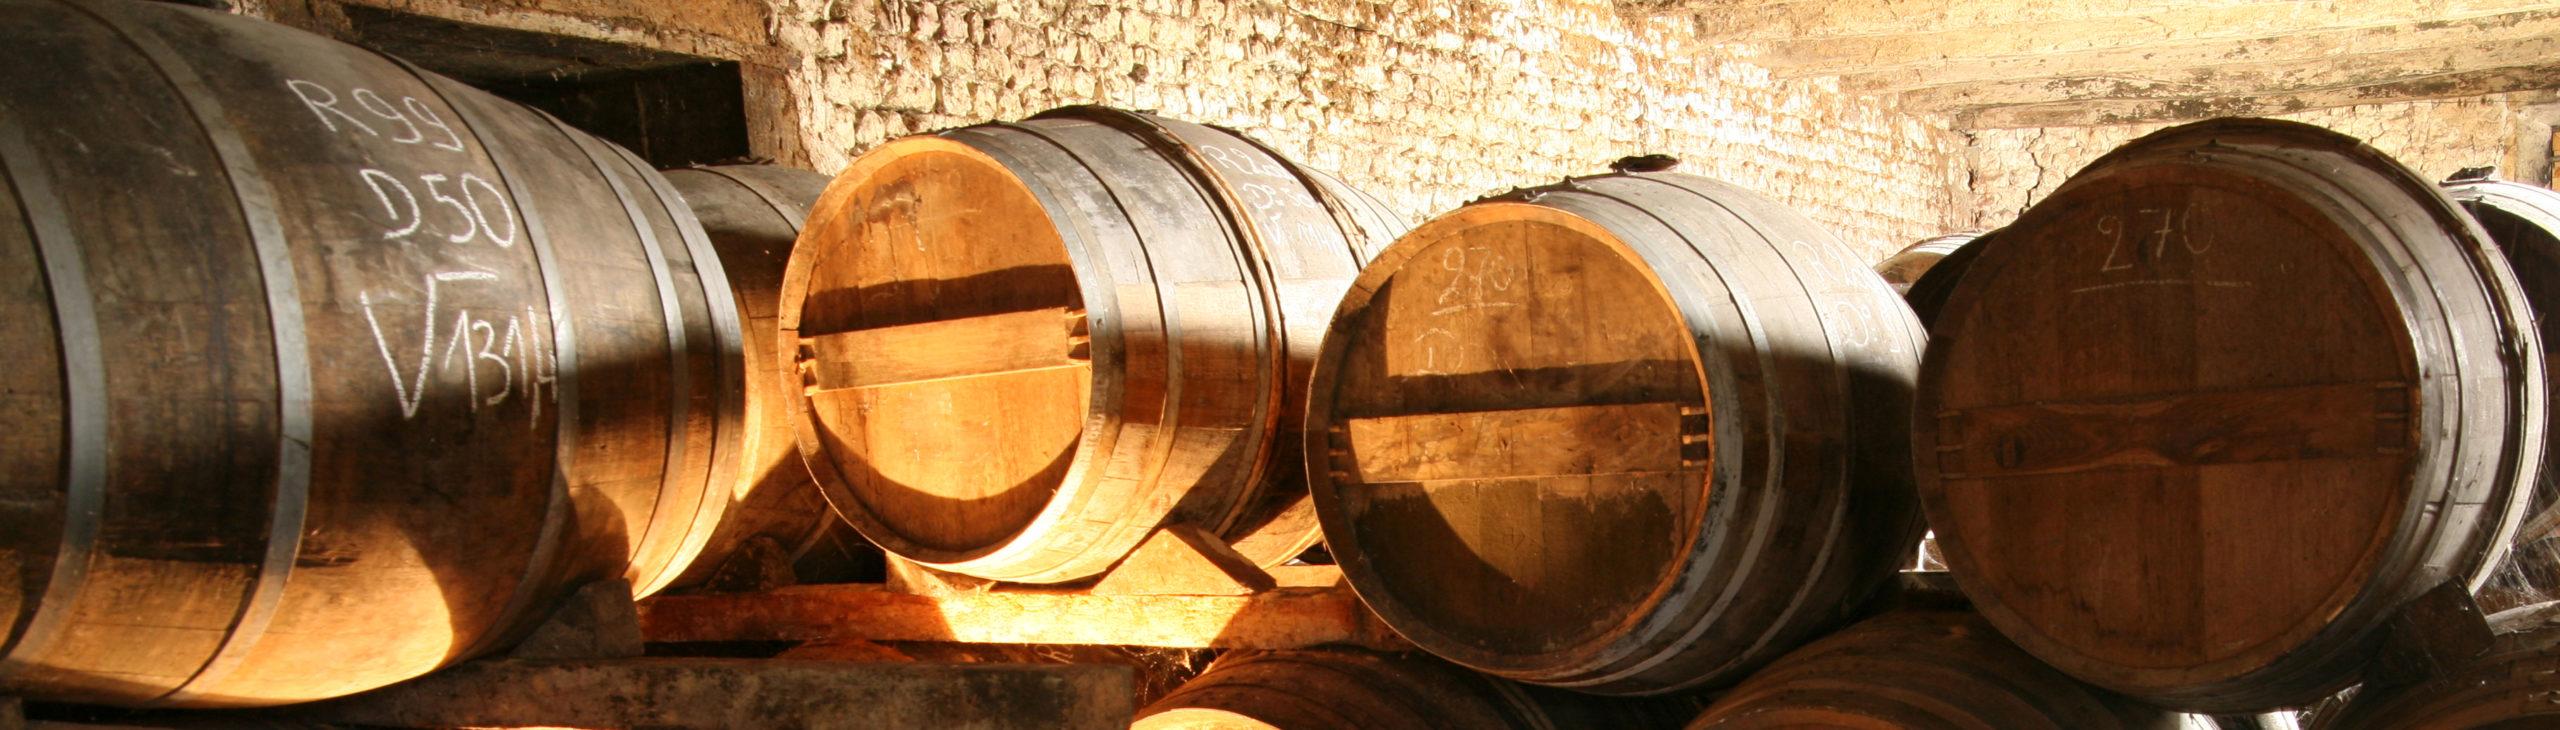 raby cognac chais